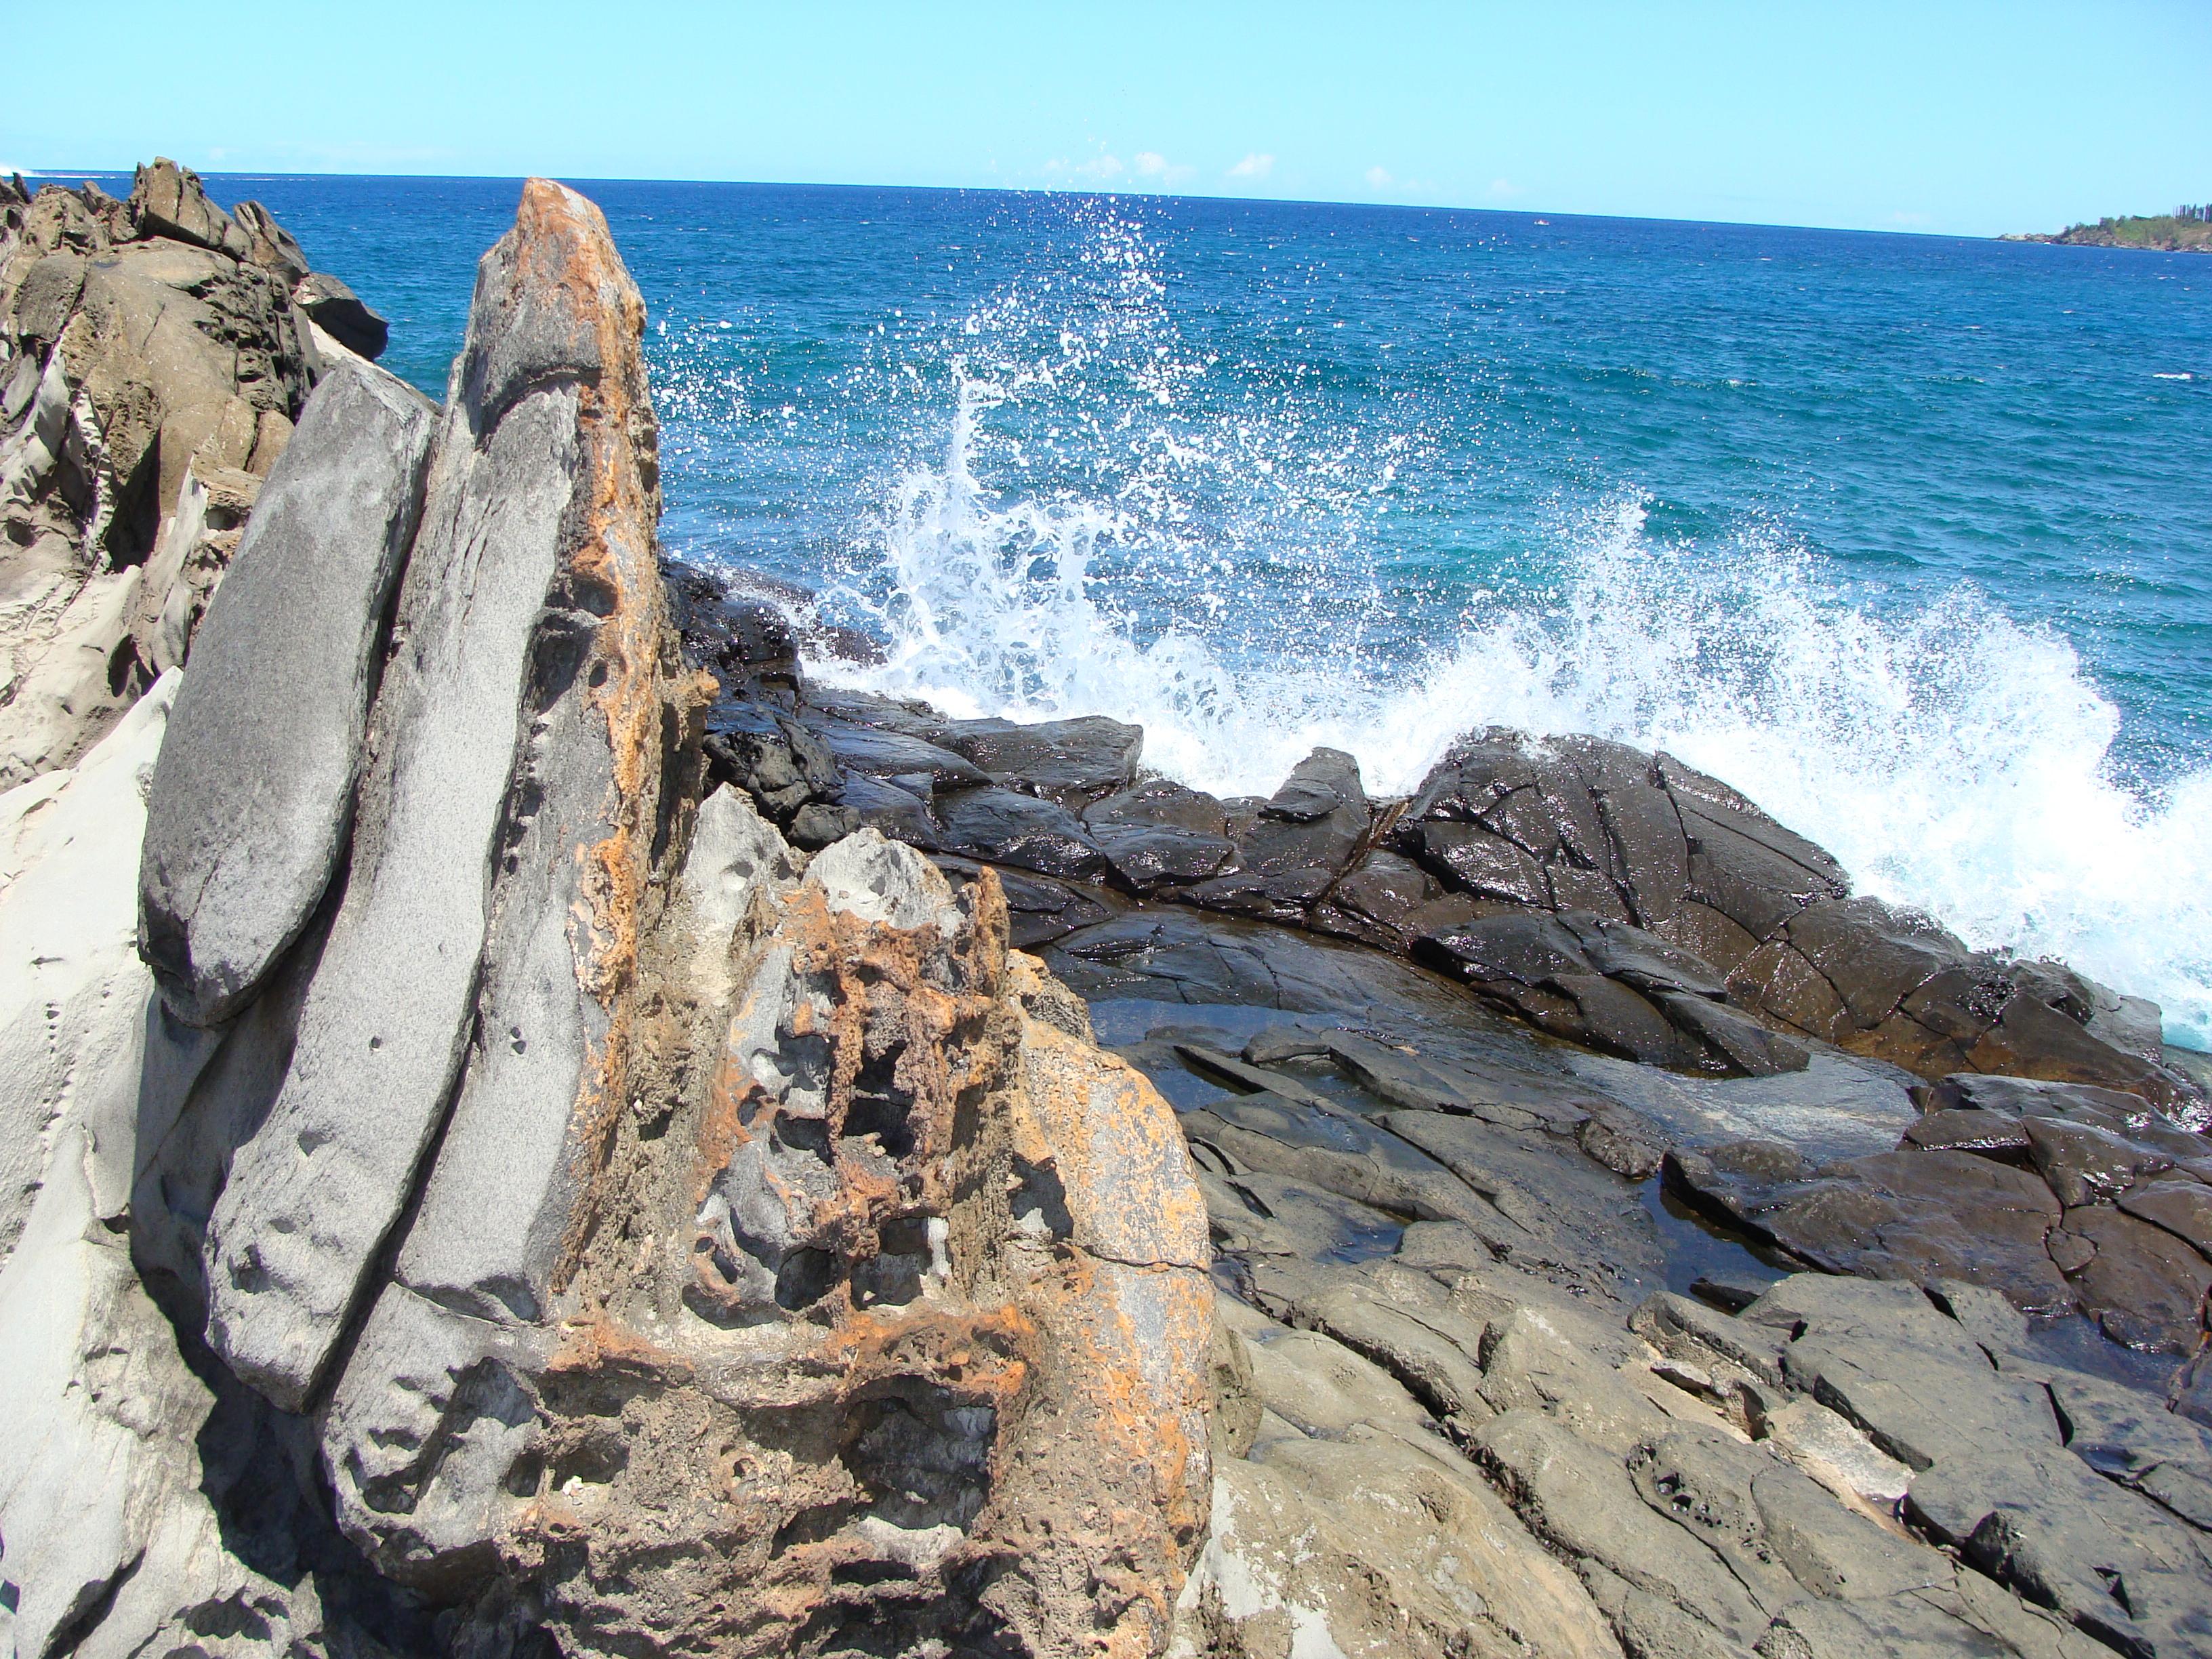 Makāluapuna Point at Honokahua. File photo by Wendy Osher.